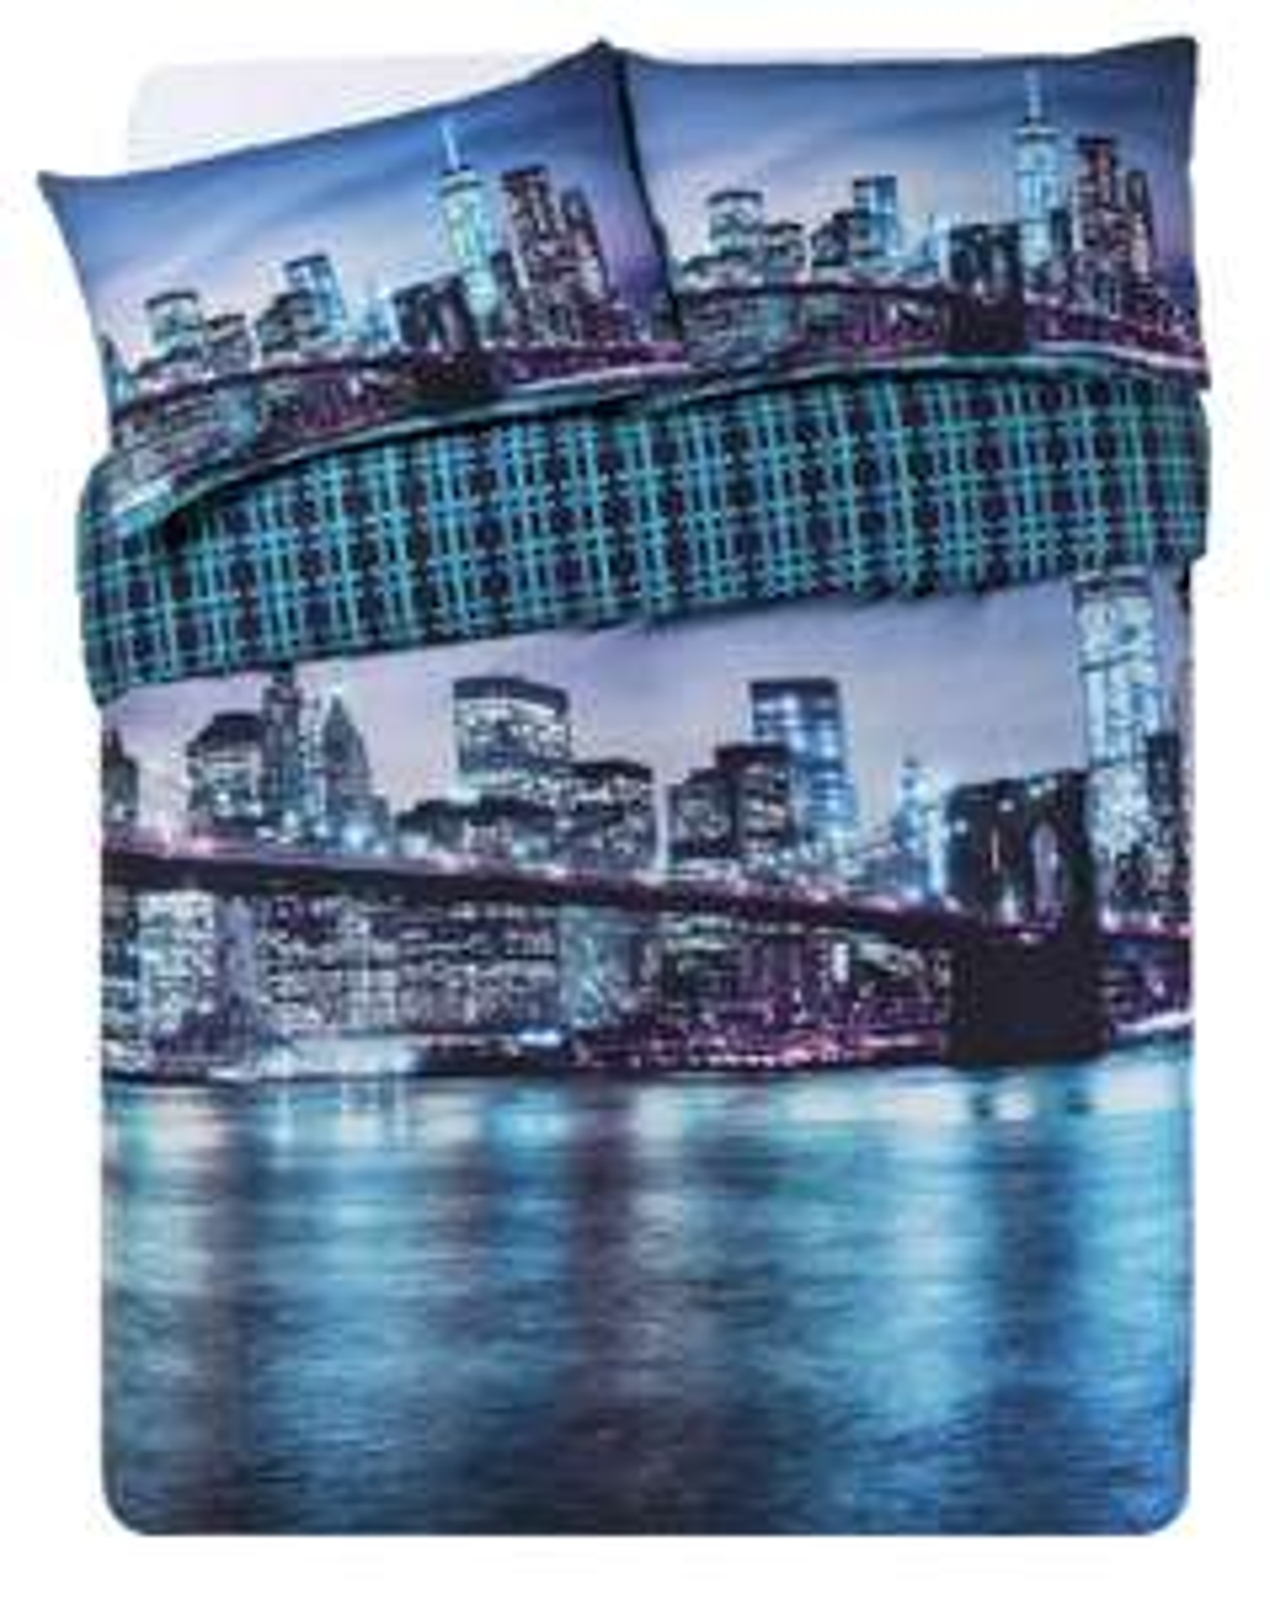 100% Cotton New York Digital Print Bedding Set - King size  £9.99 Delivered  @ Argos on eBay